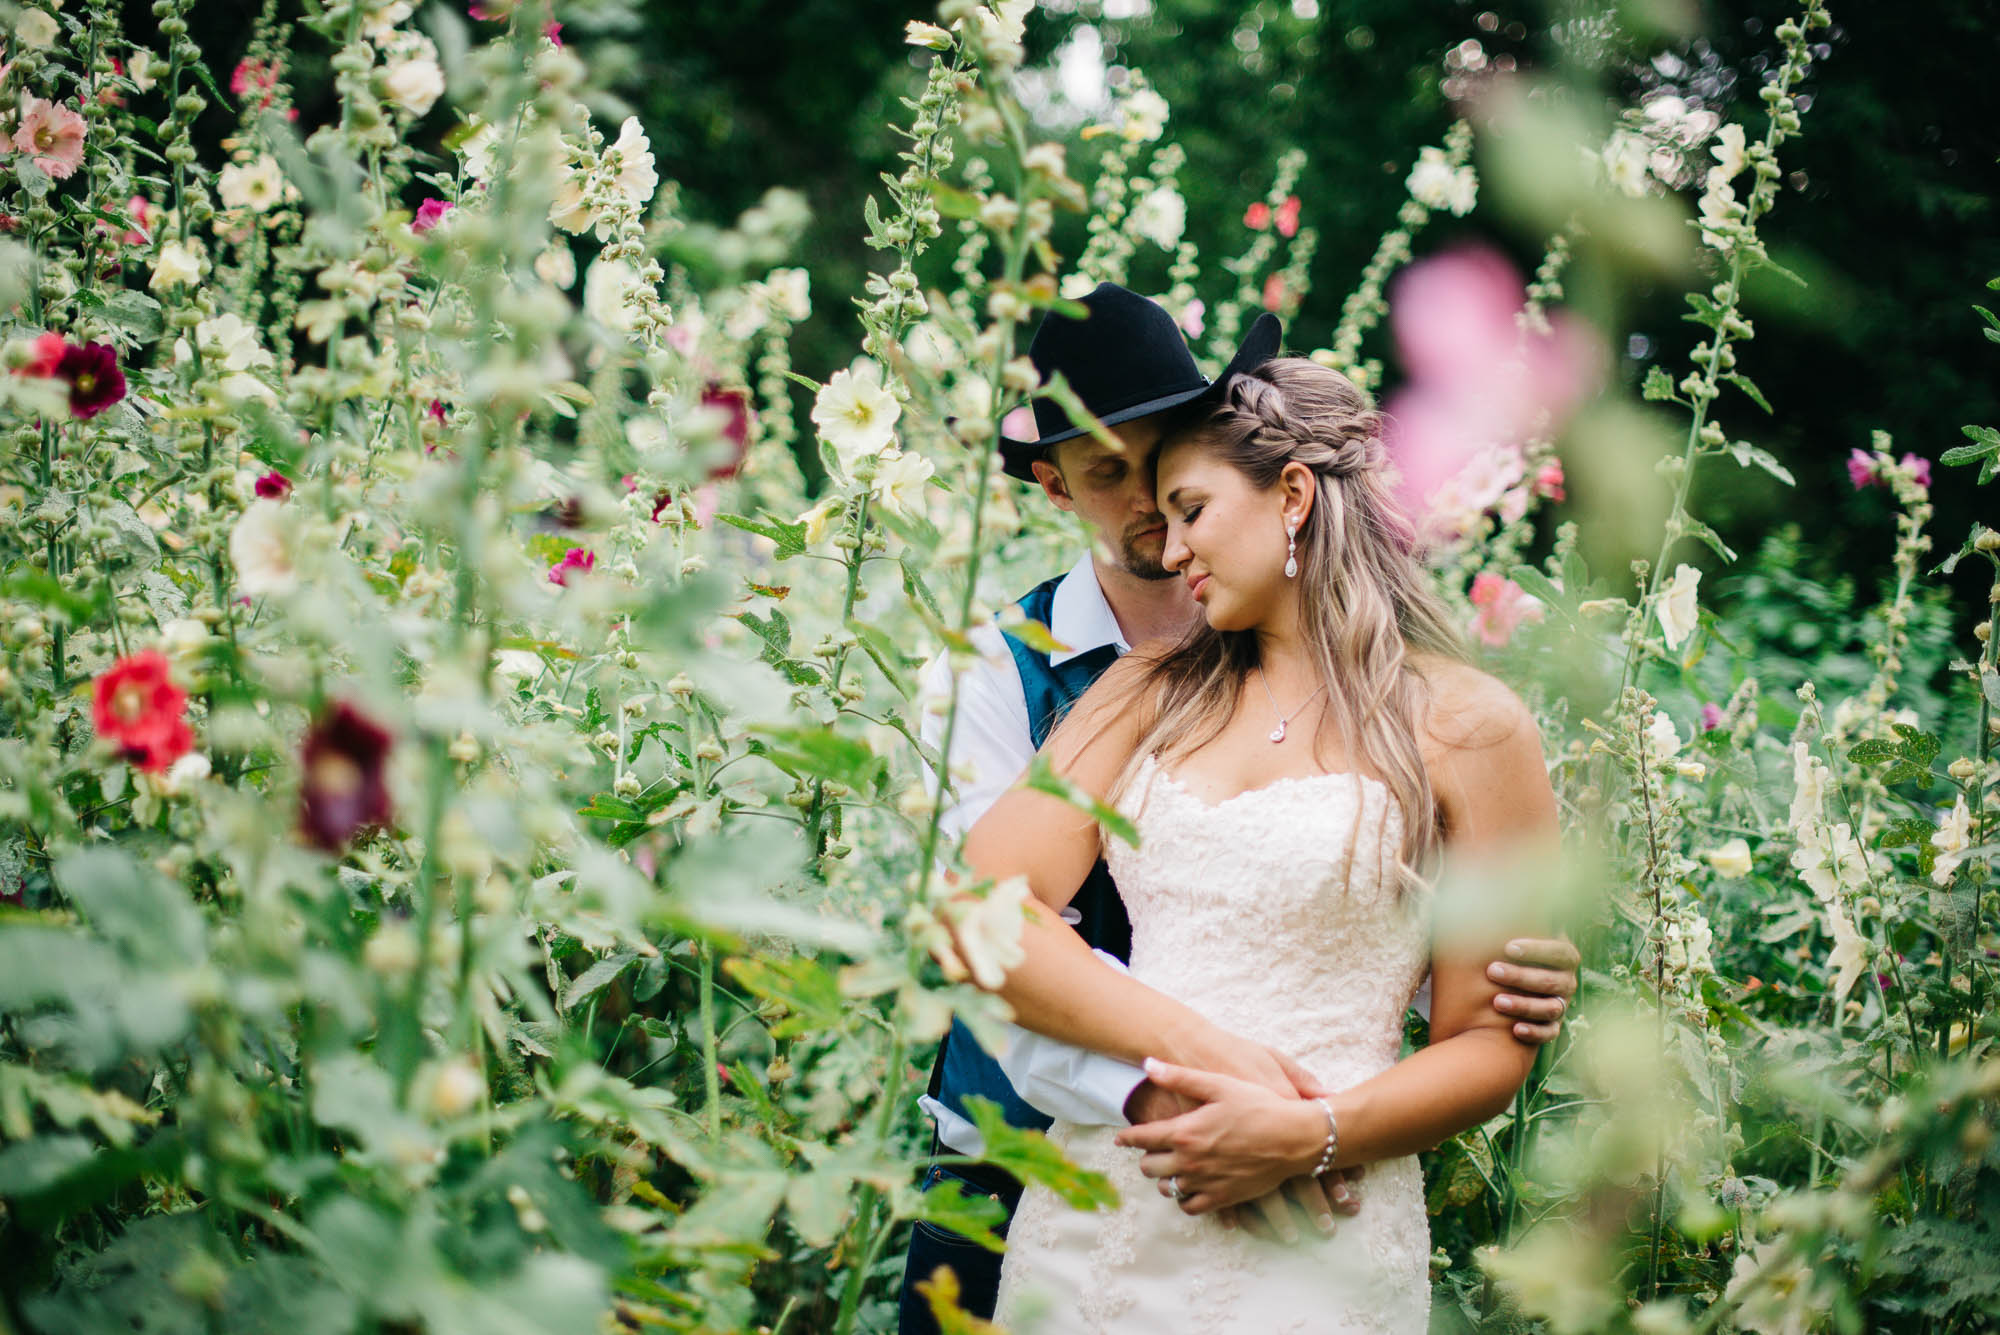 87elopement-photographer-colorado-lyons-farmette-wedding-amy&ben-2087.jpg